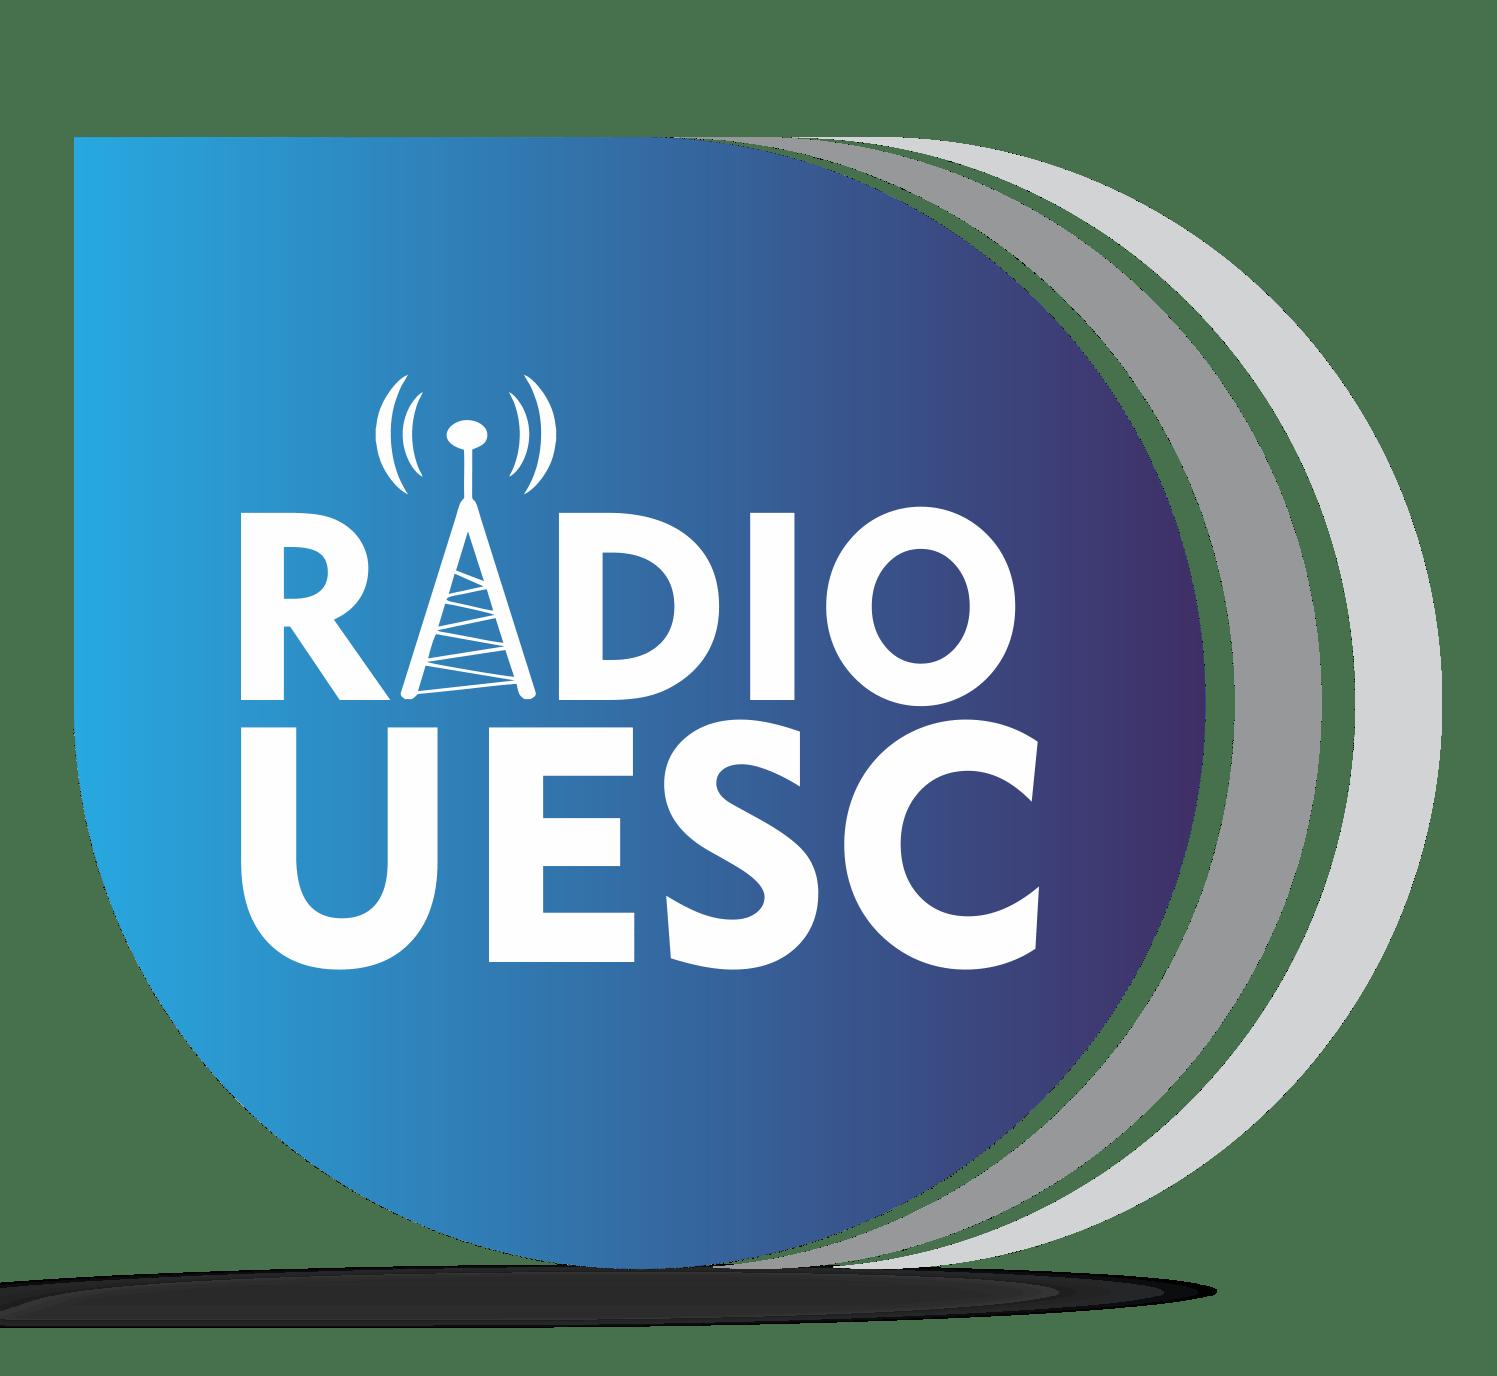 radio uesc